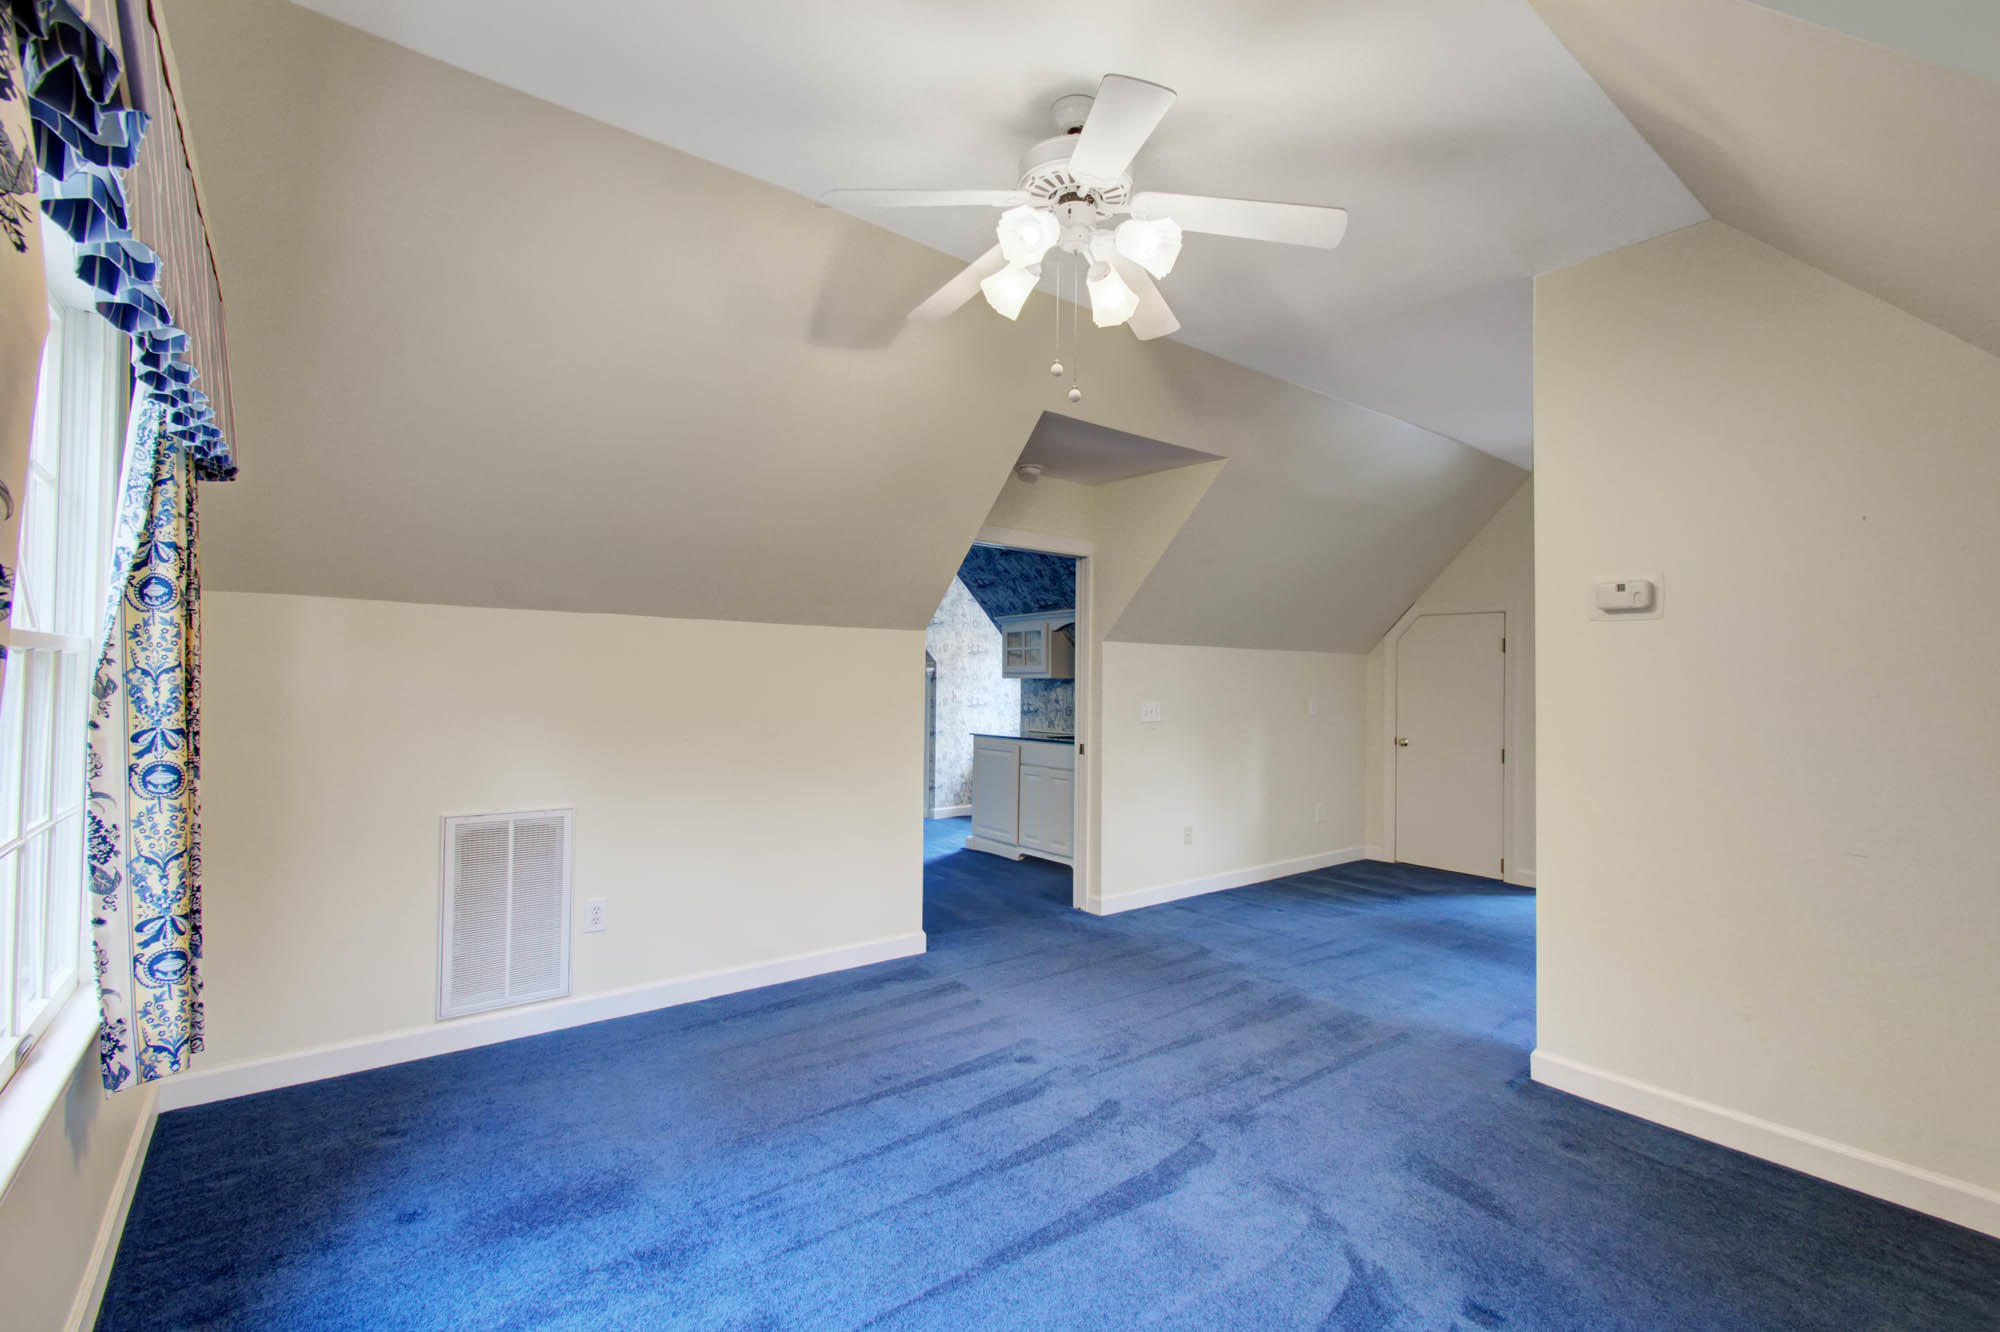 Dunes West Homes For Sale - 3515 Colonel Vanderhorst, Mount Pleasant, SC - 14